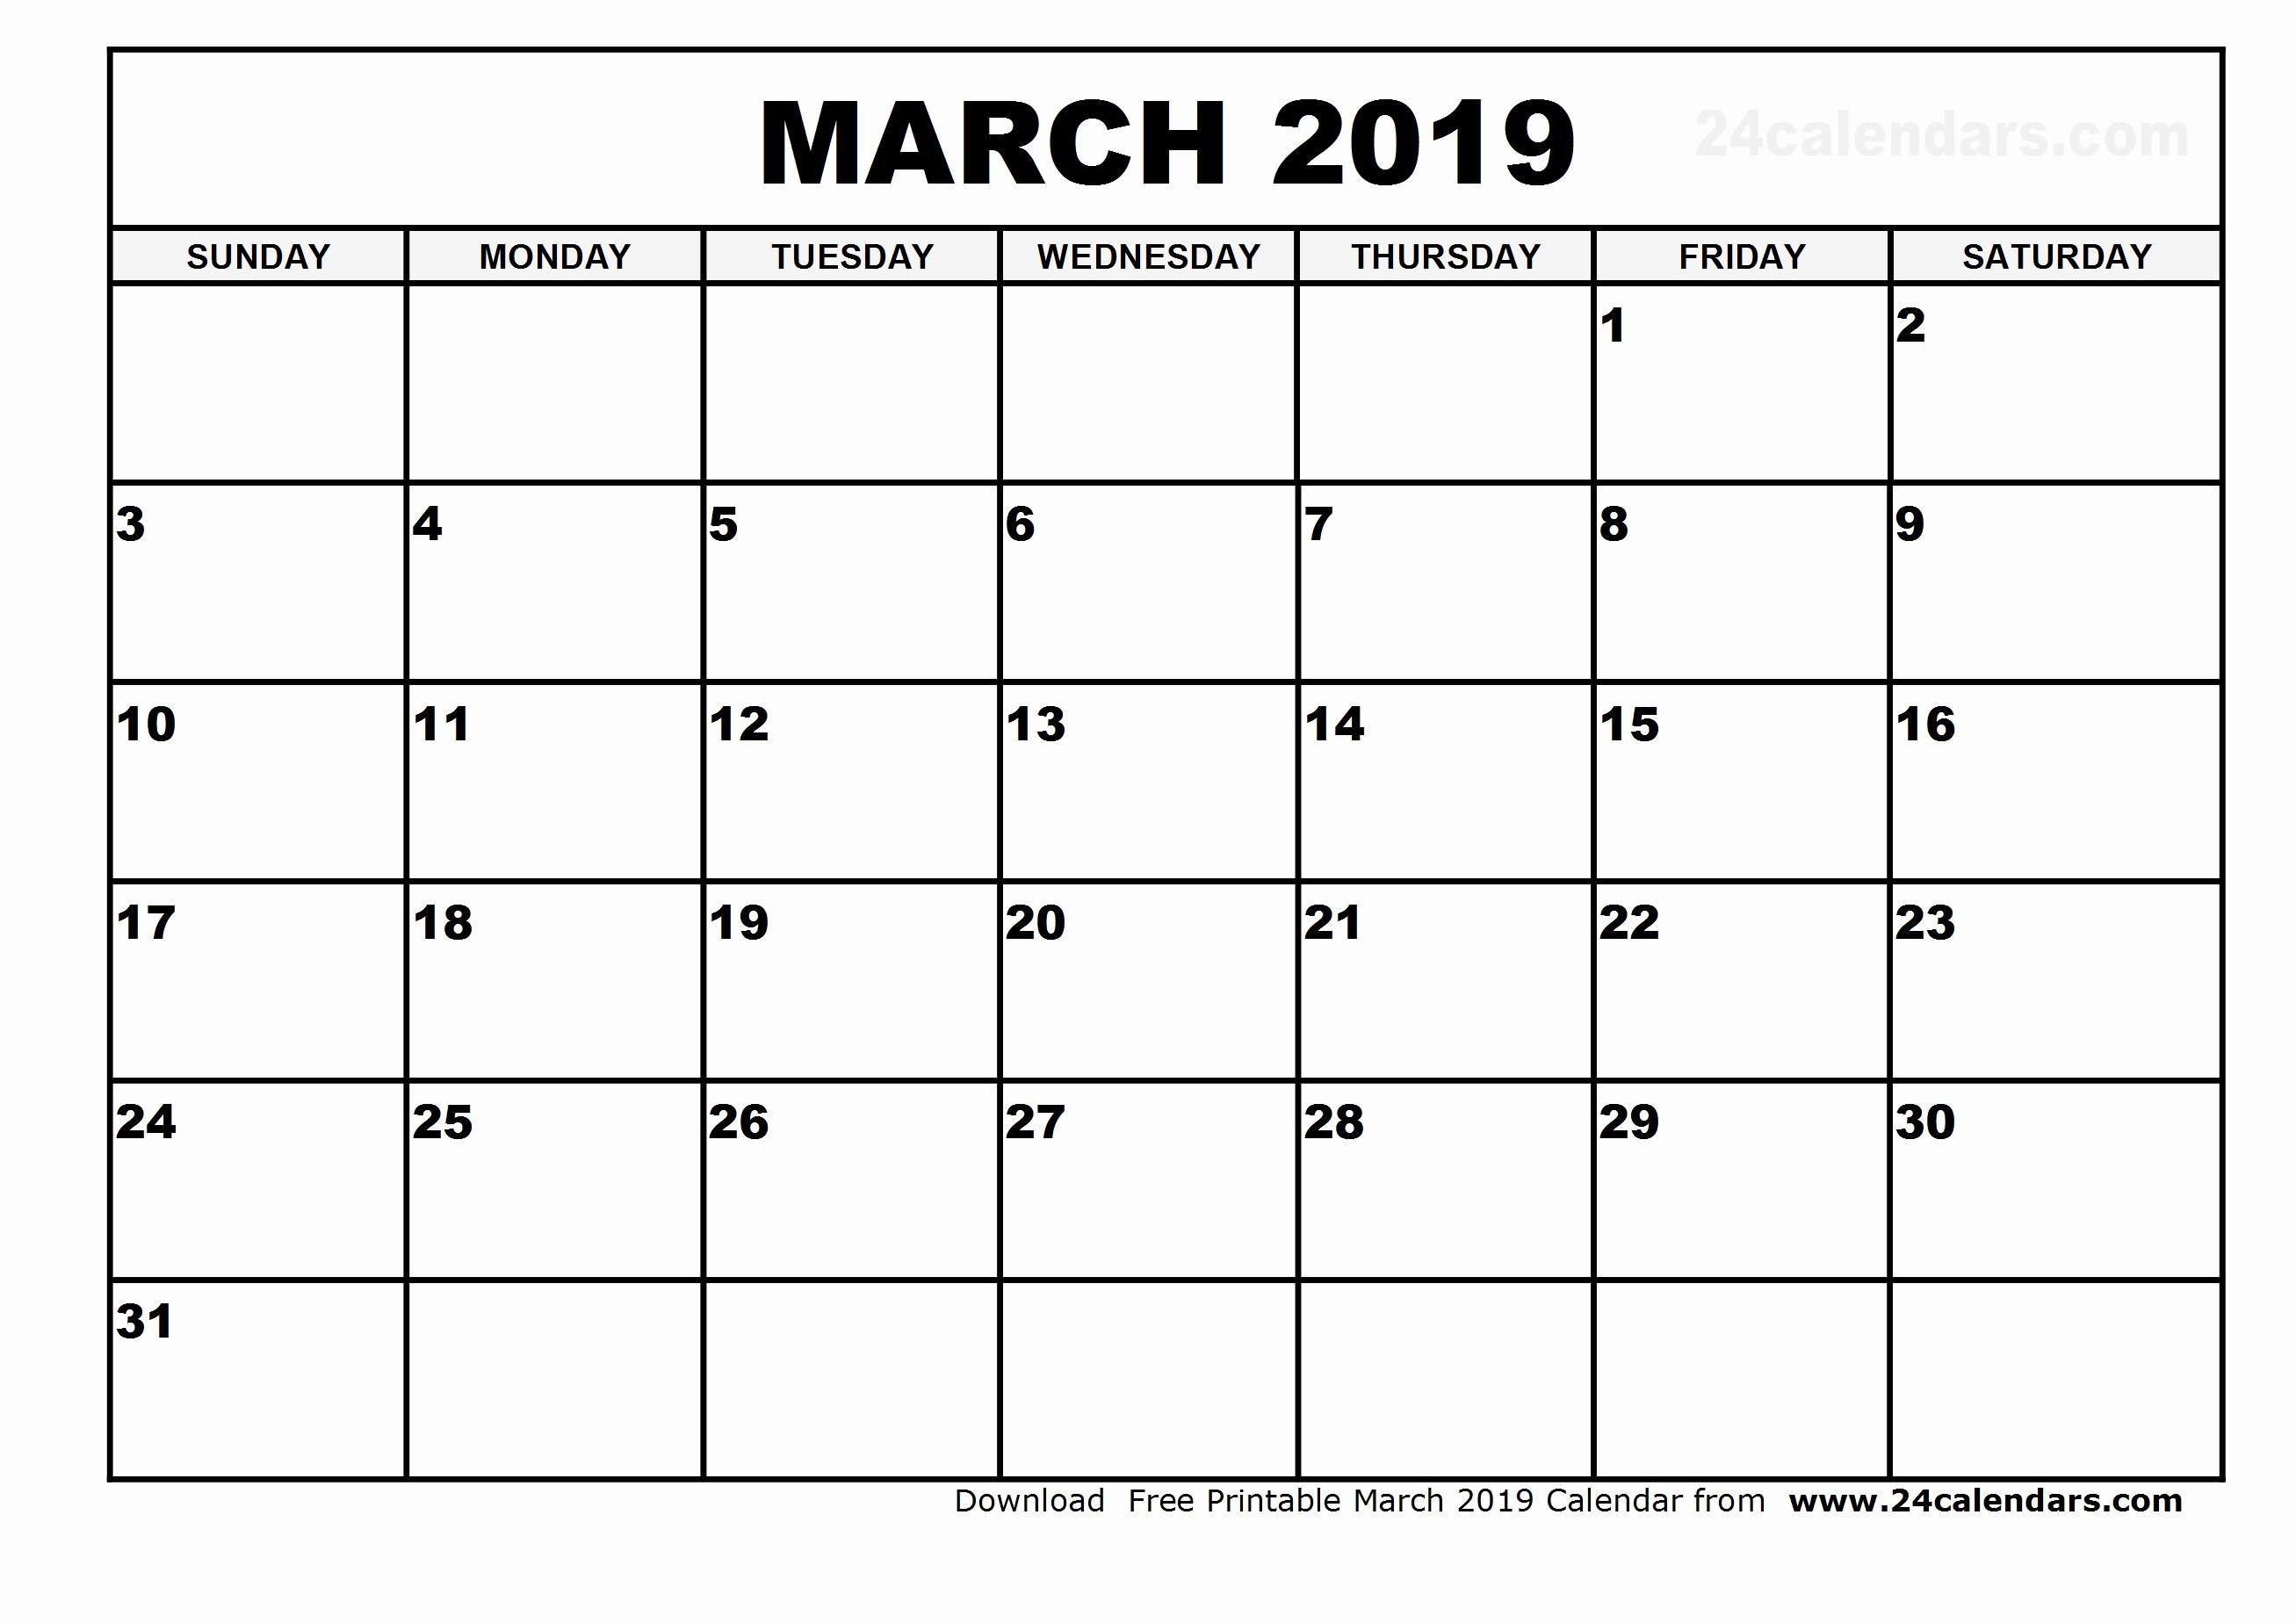 Free Printable Calendar Templates 2019 Luxury March 2019 Calendar Template